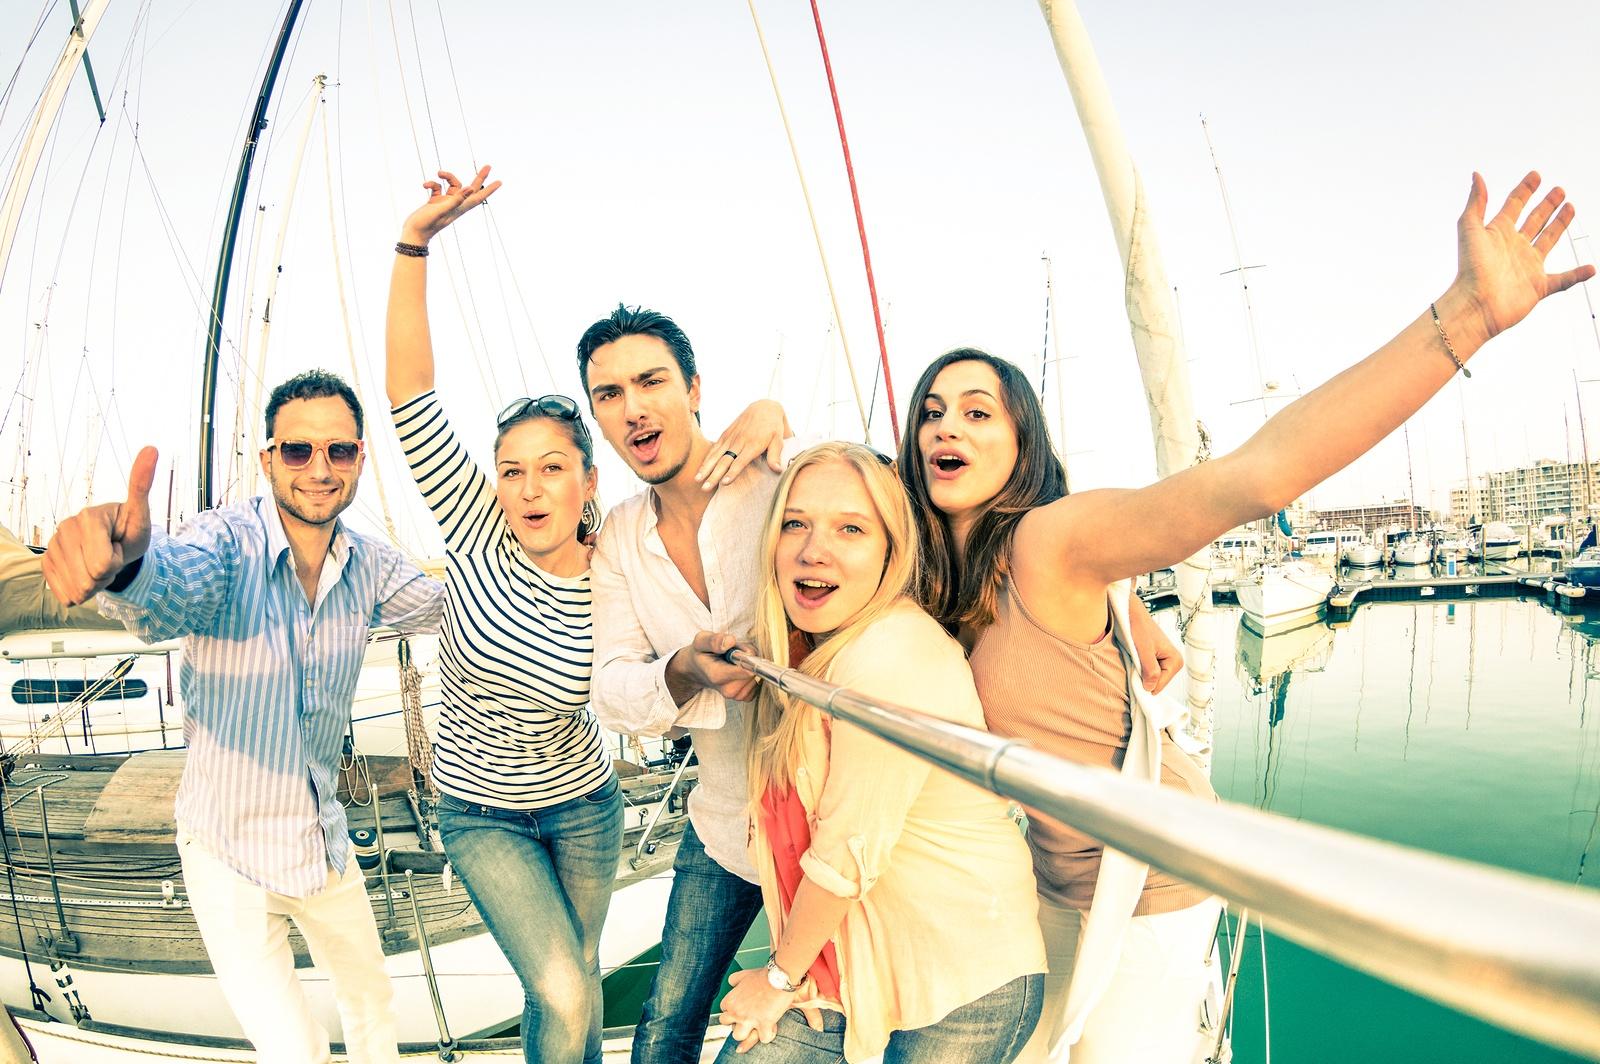 bigstock-Best-Friends-Using-Selfie-Stic-93238793.jpg